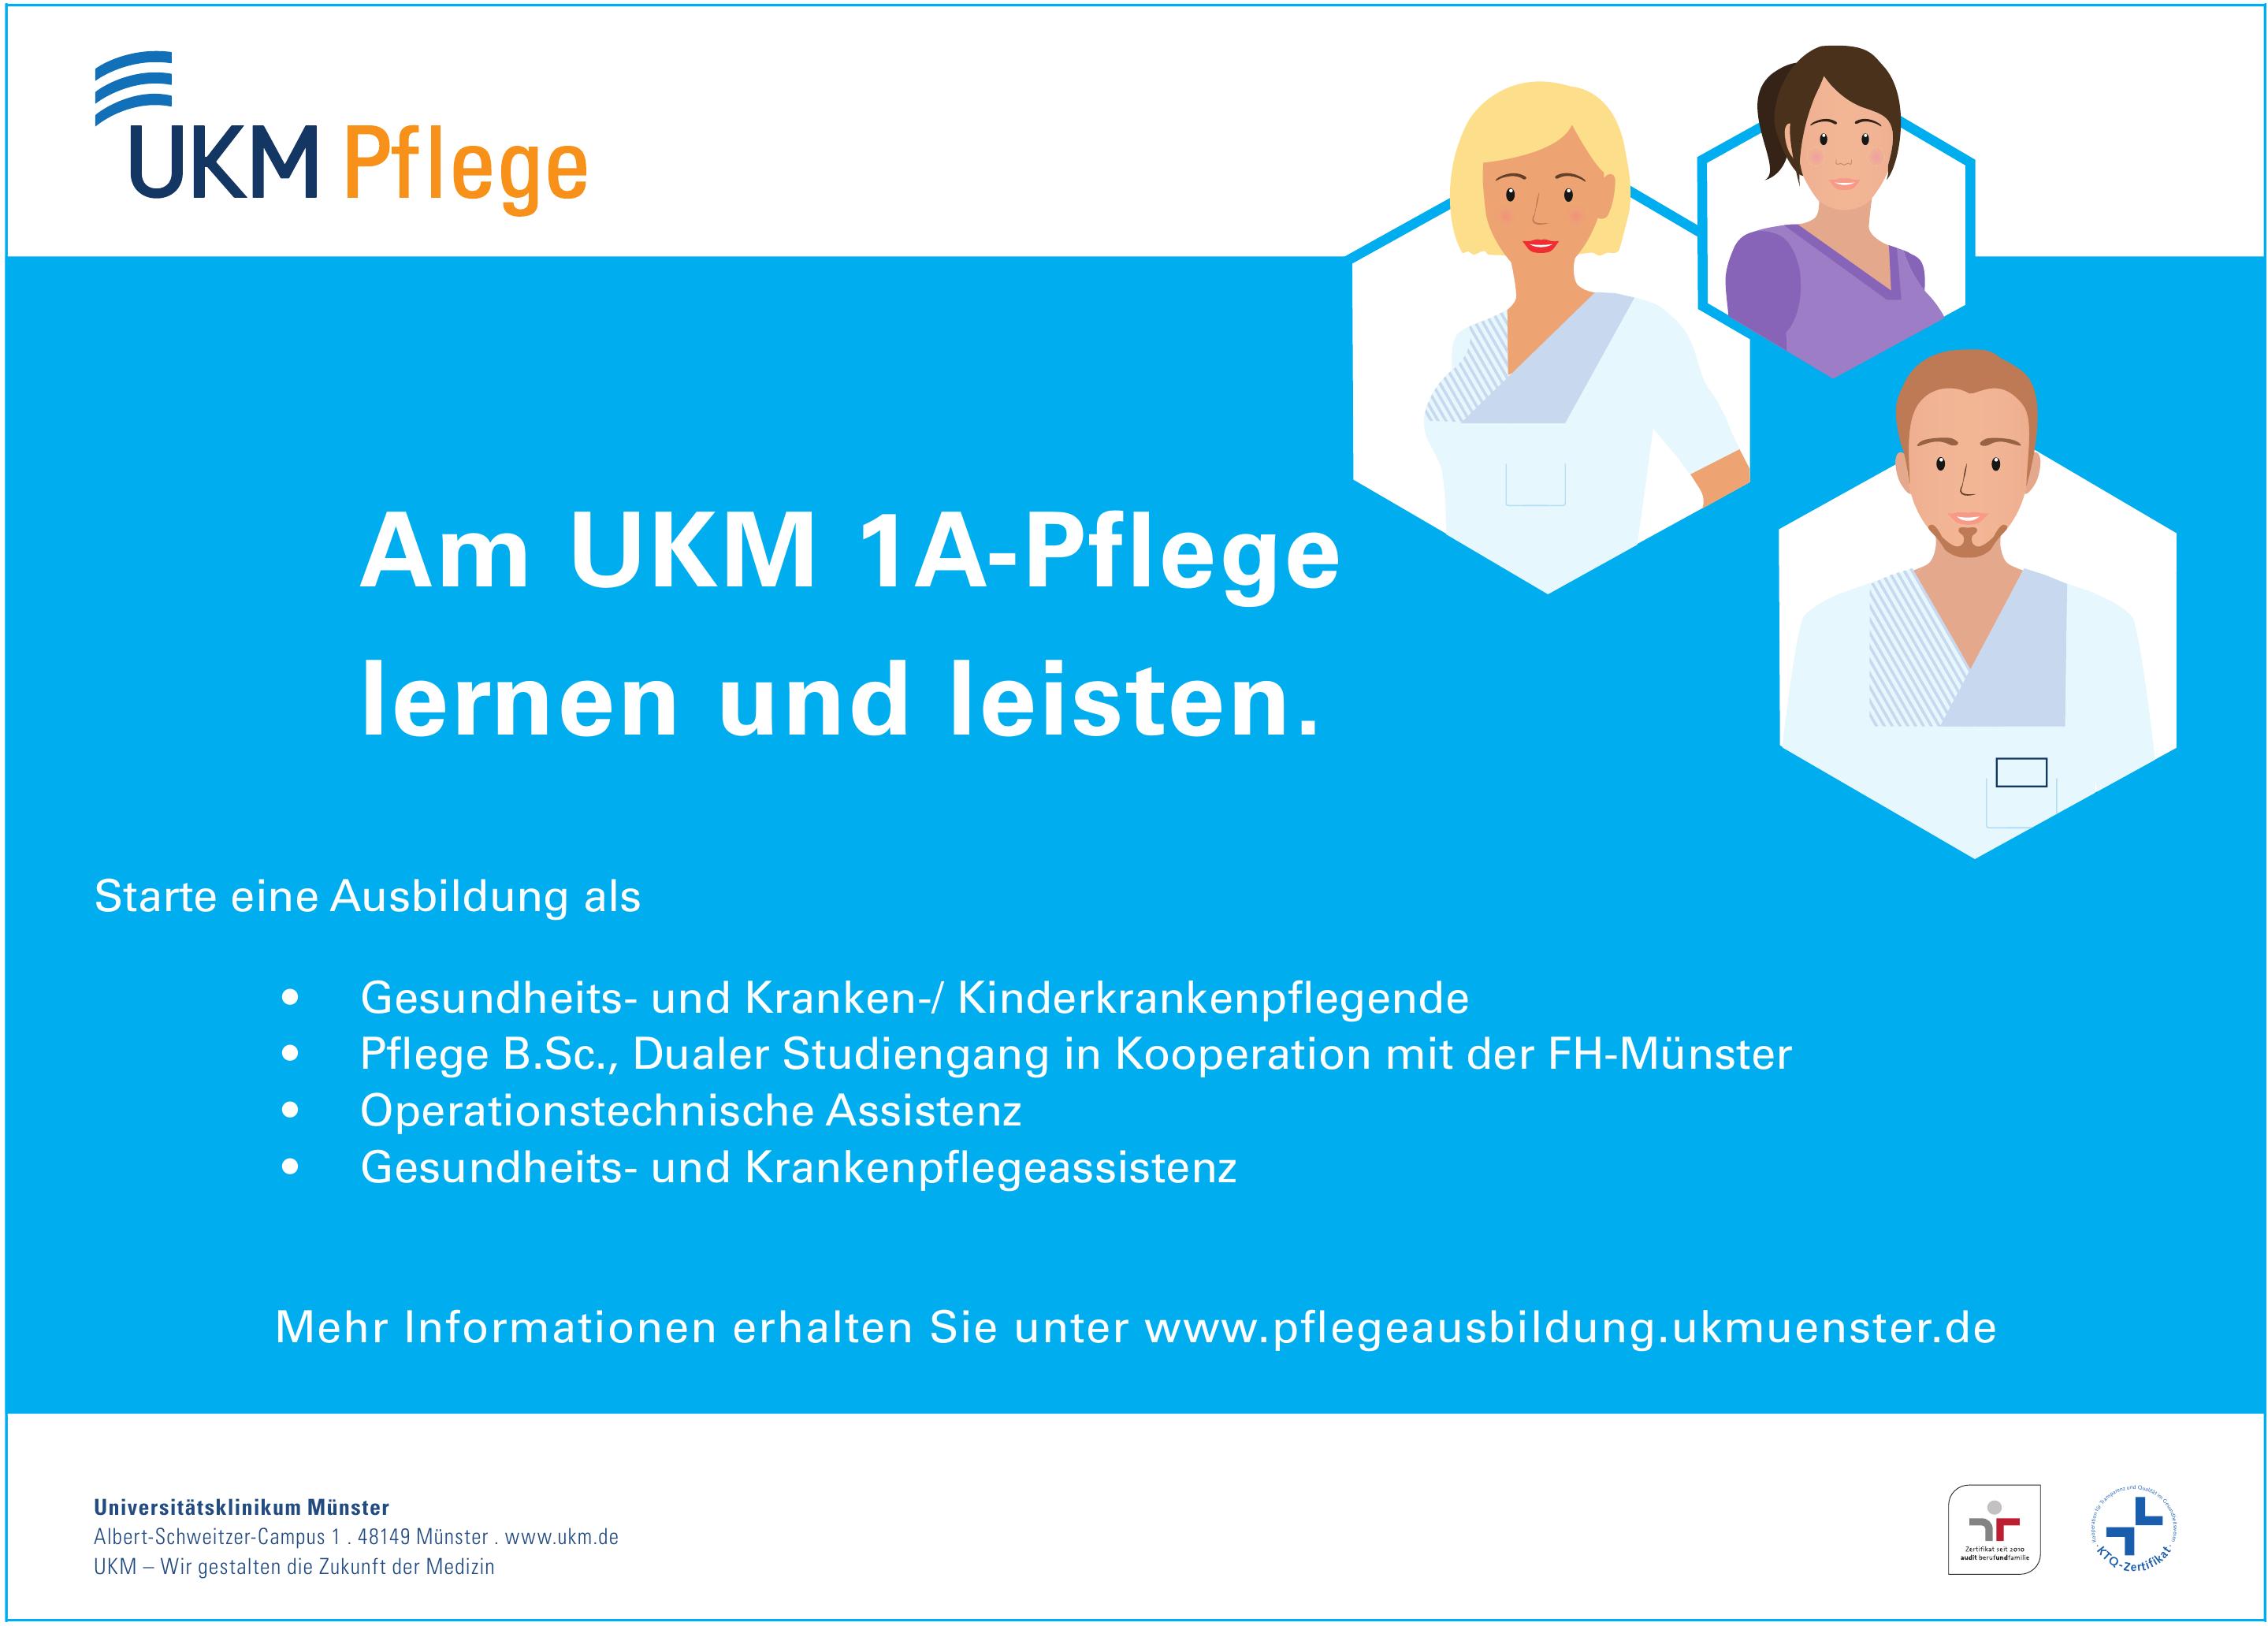 UKM Pflege - Universitätsklinikum Münster